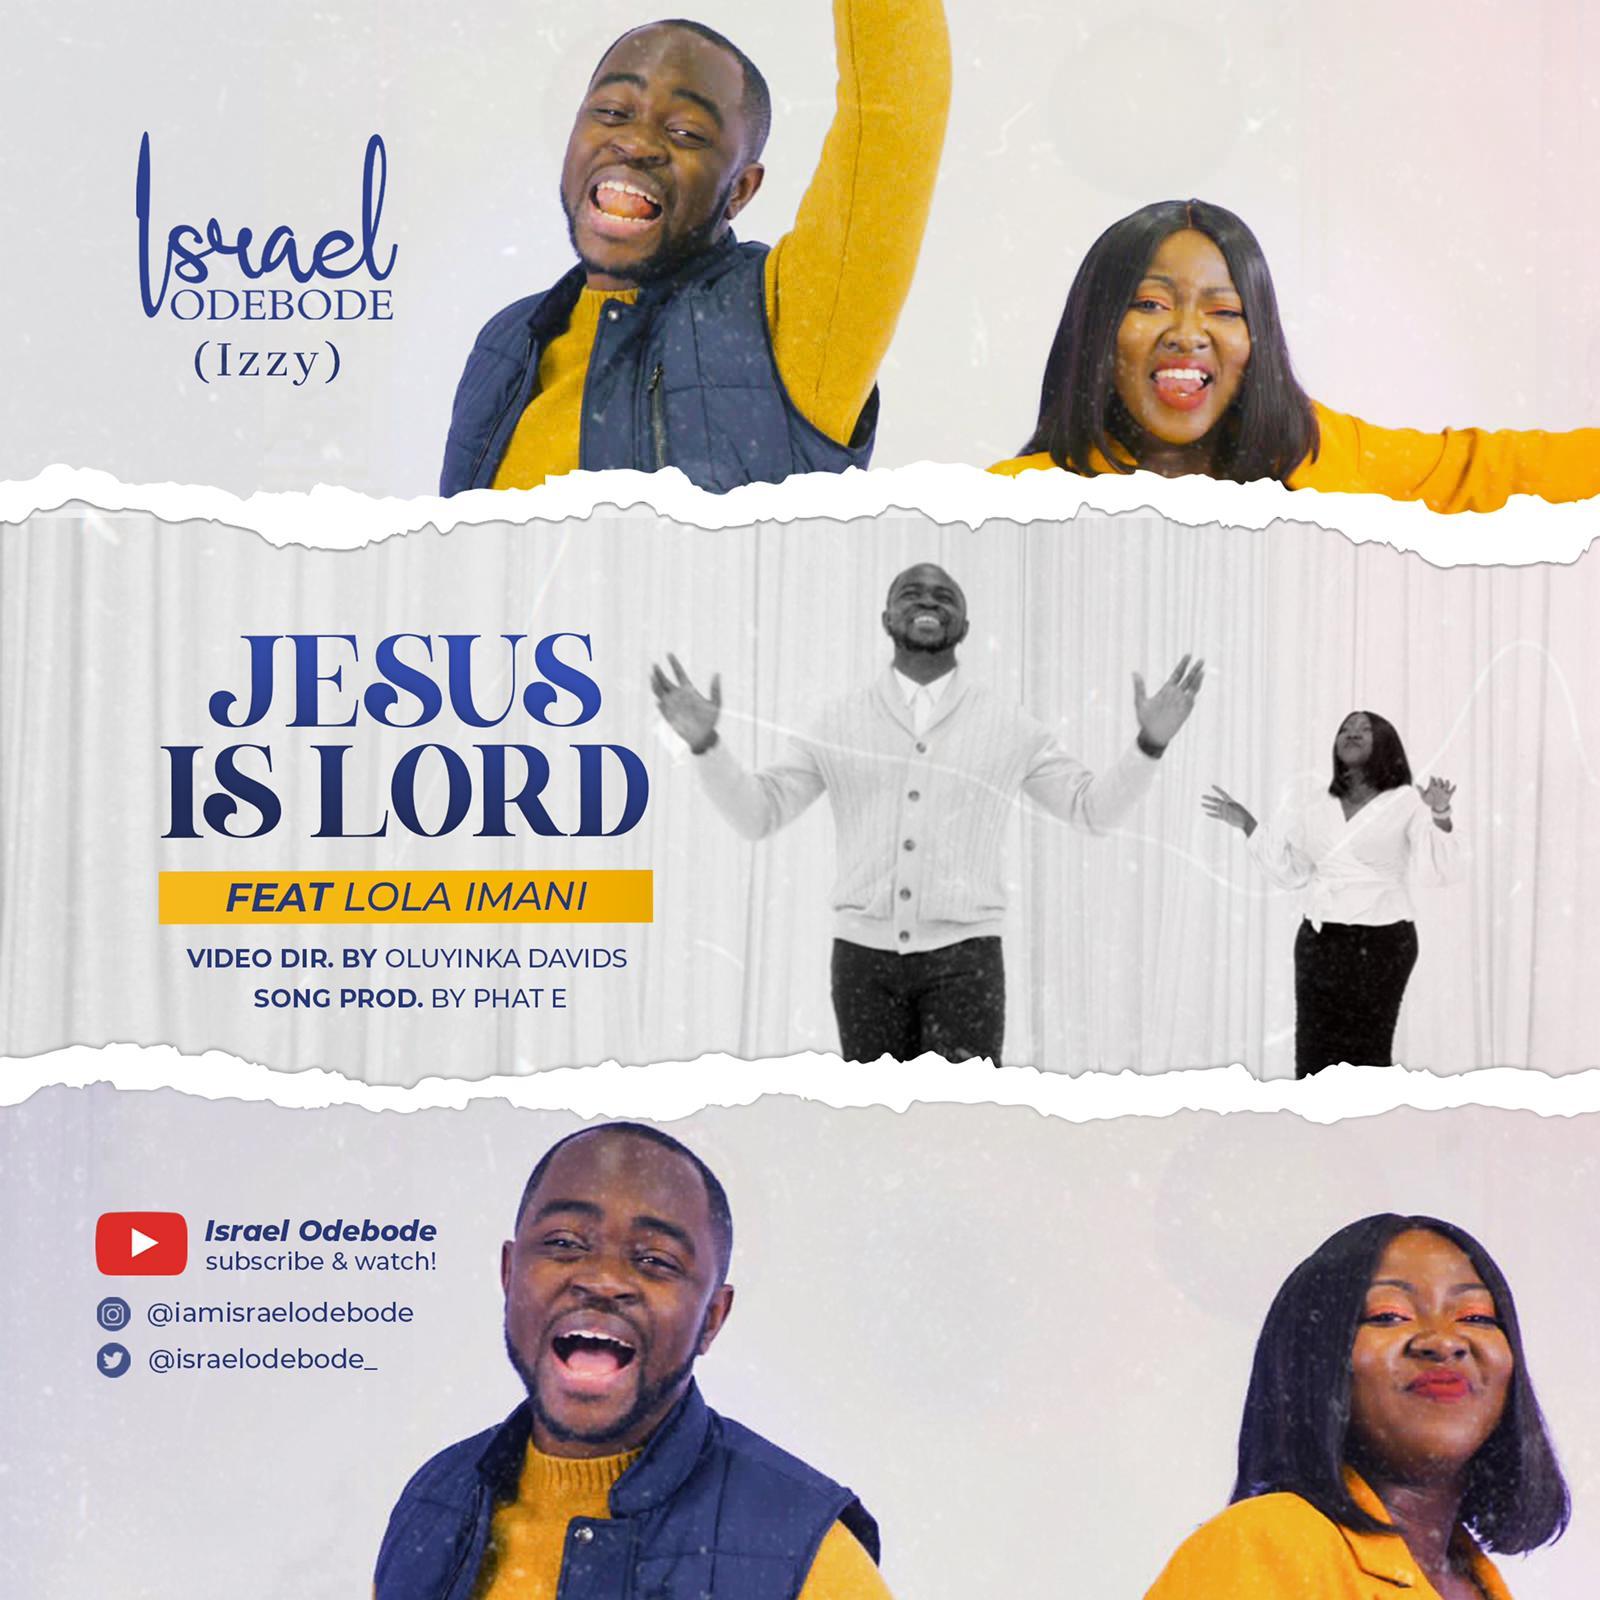 Jesus Is Lord - Israel Odebode Ft. Lola Imani